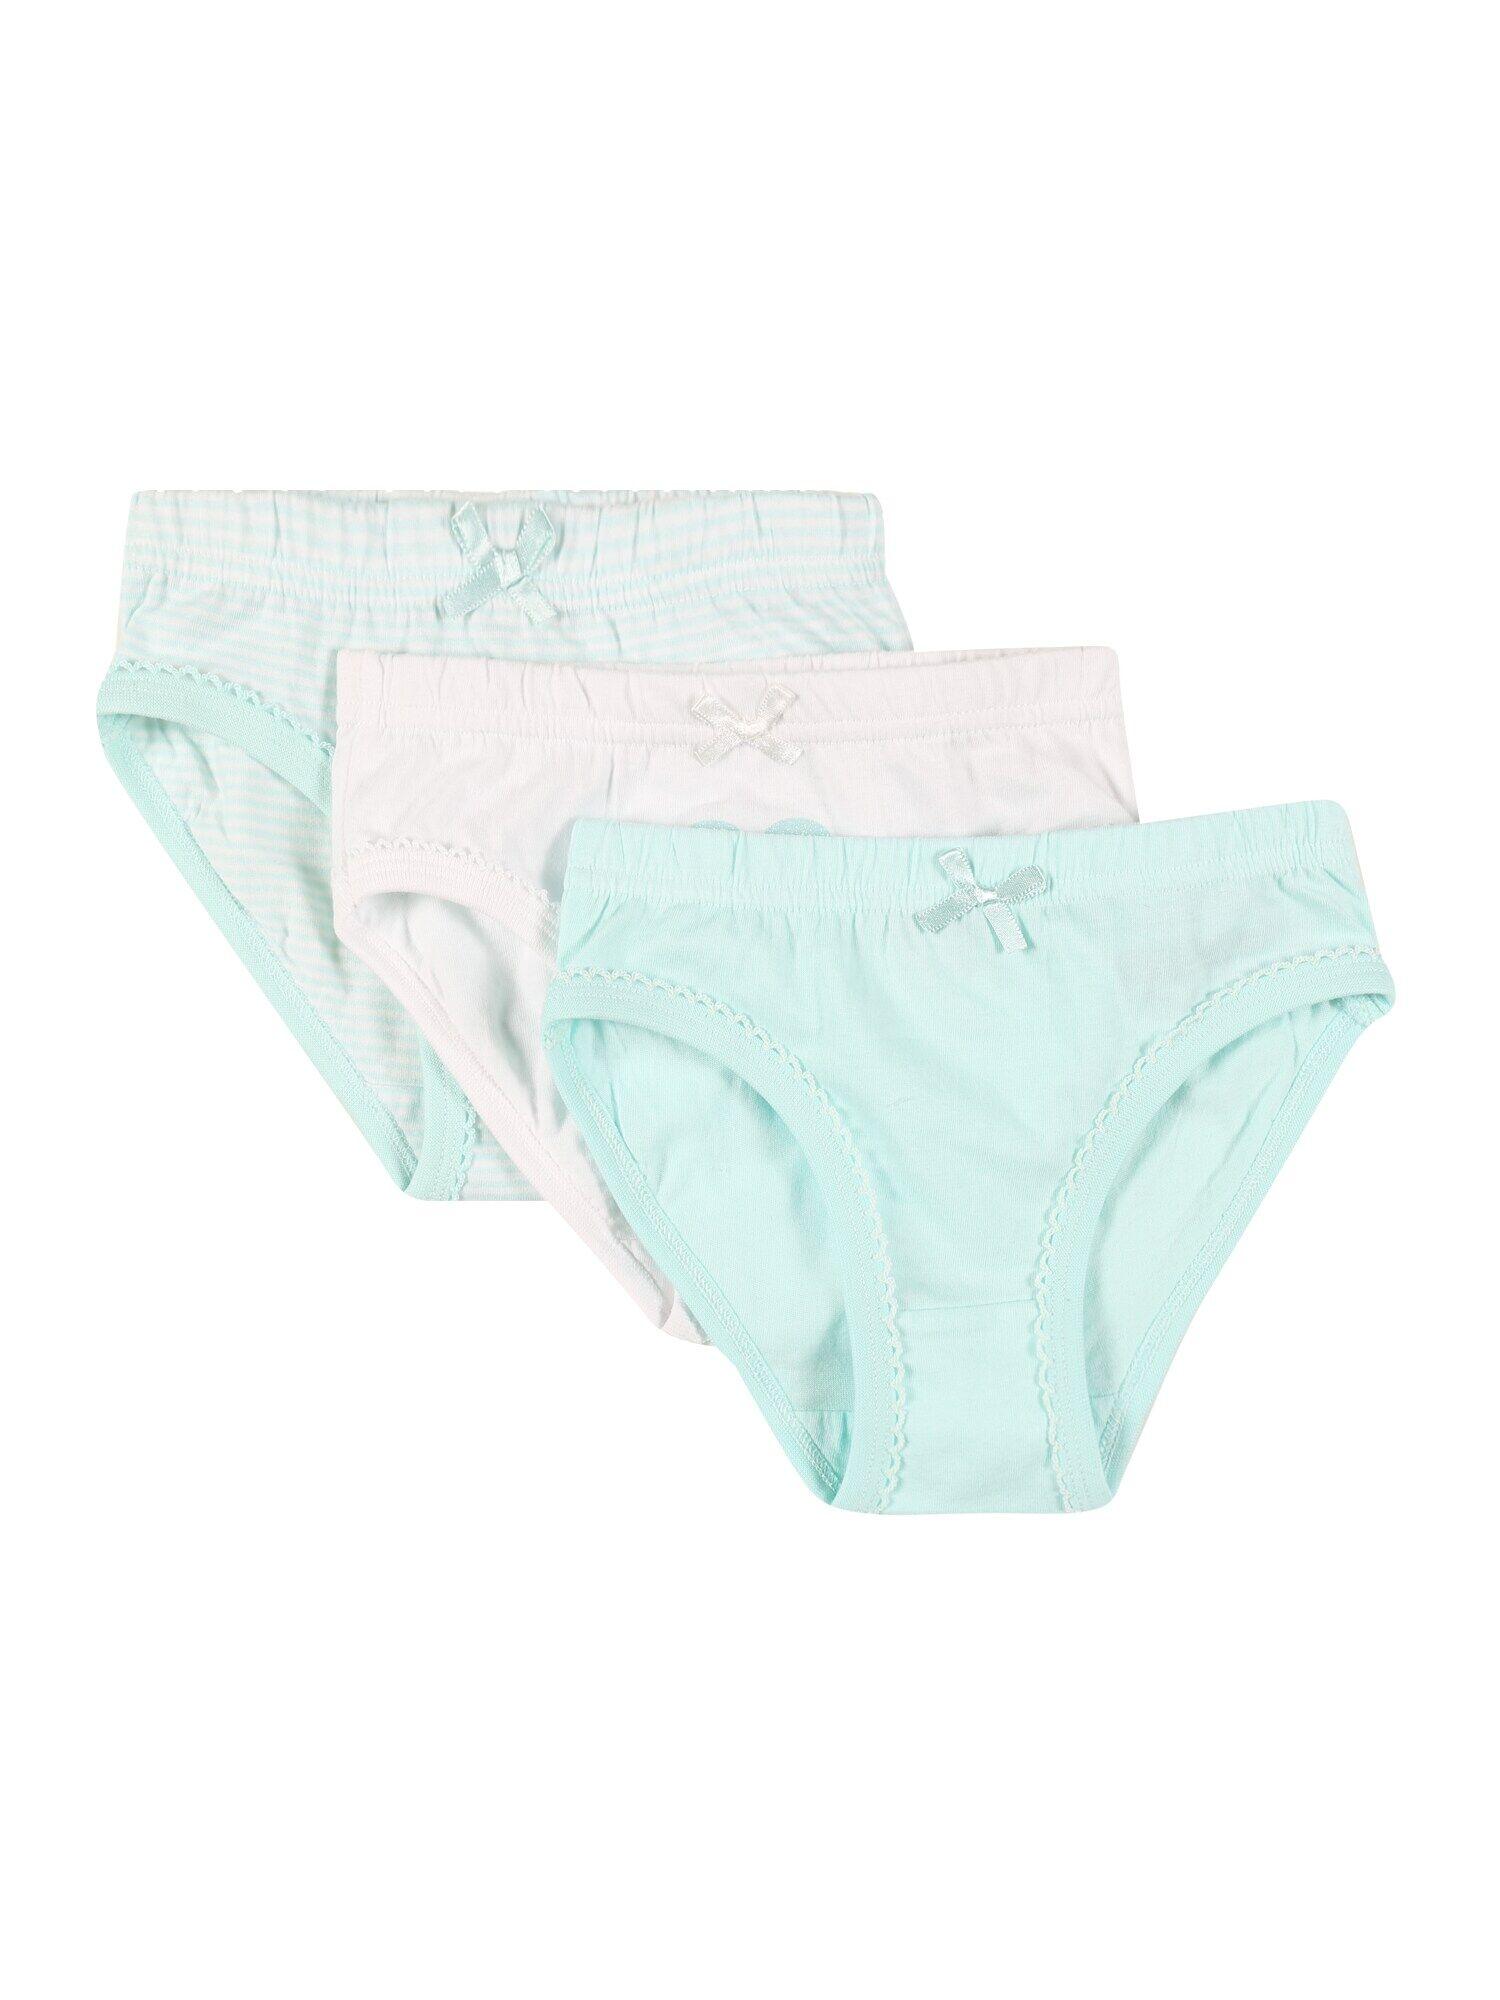 JACKY Sous-vêtements  - Vert, Blanc - Taille: 90 - girl